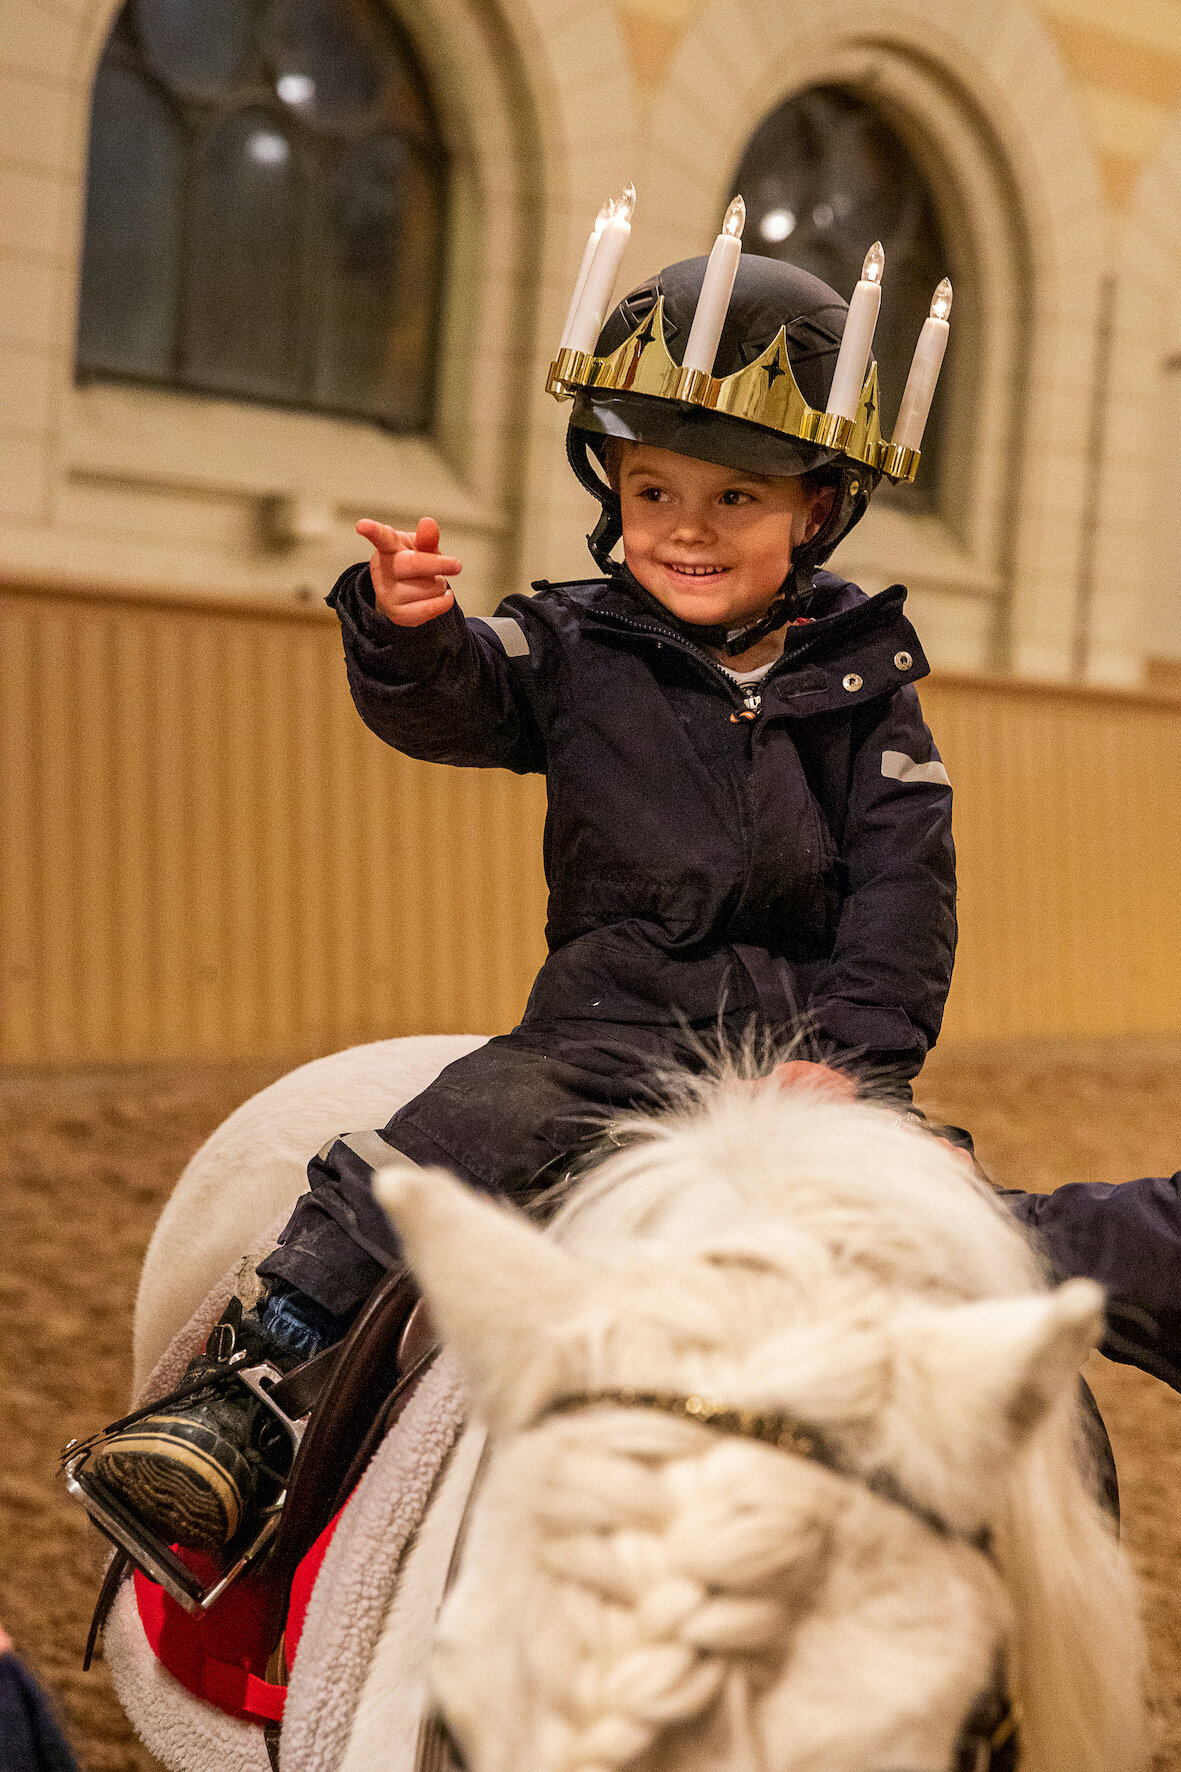 Prinz Oscar strahlt: Er darf den Lichterkranz tragen.  © Sara Friberg, Royal. Hovstaatna